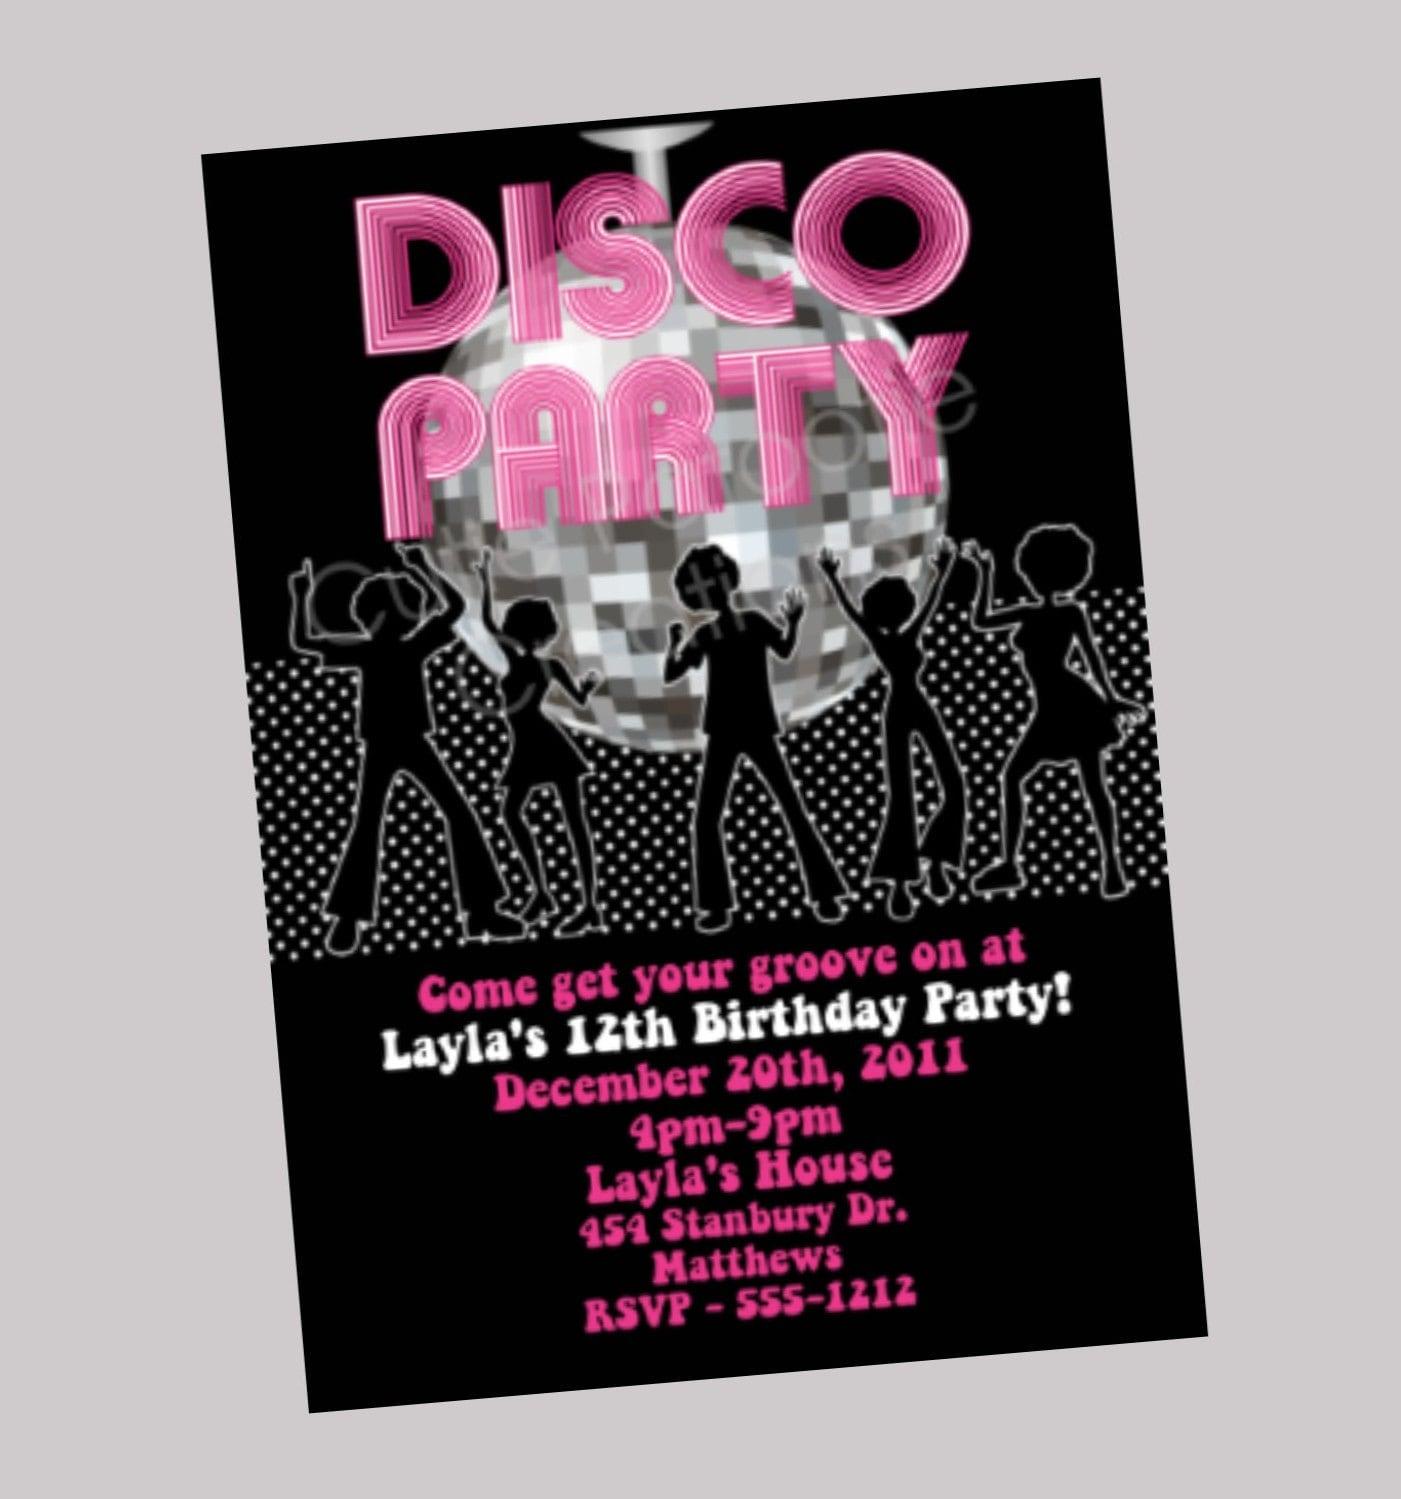 hip hop disco dance party invitation disco ball by